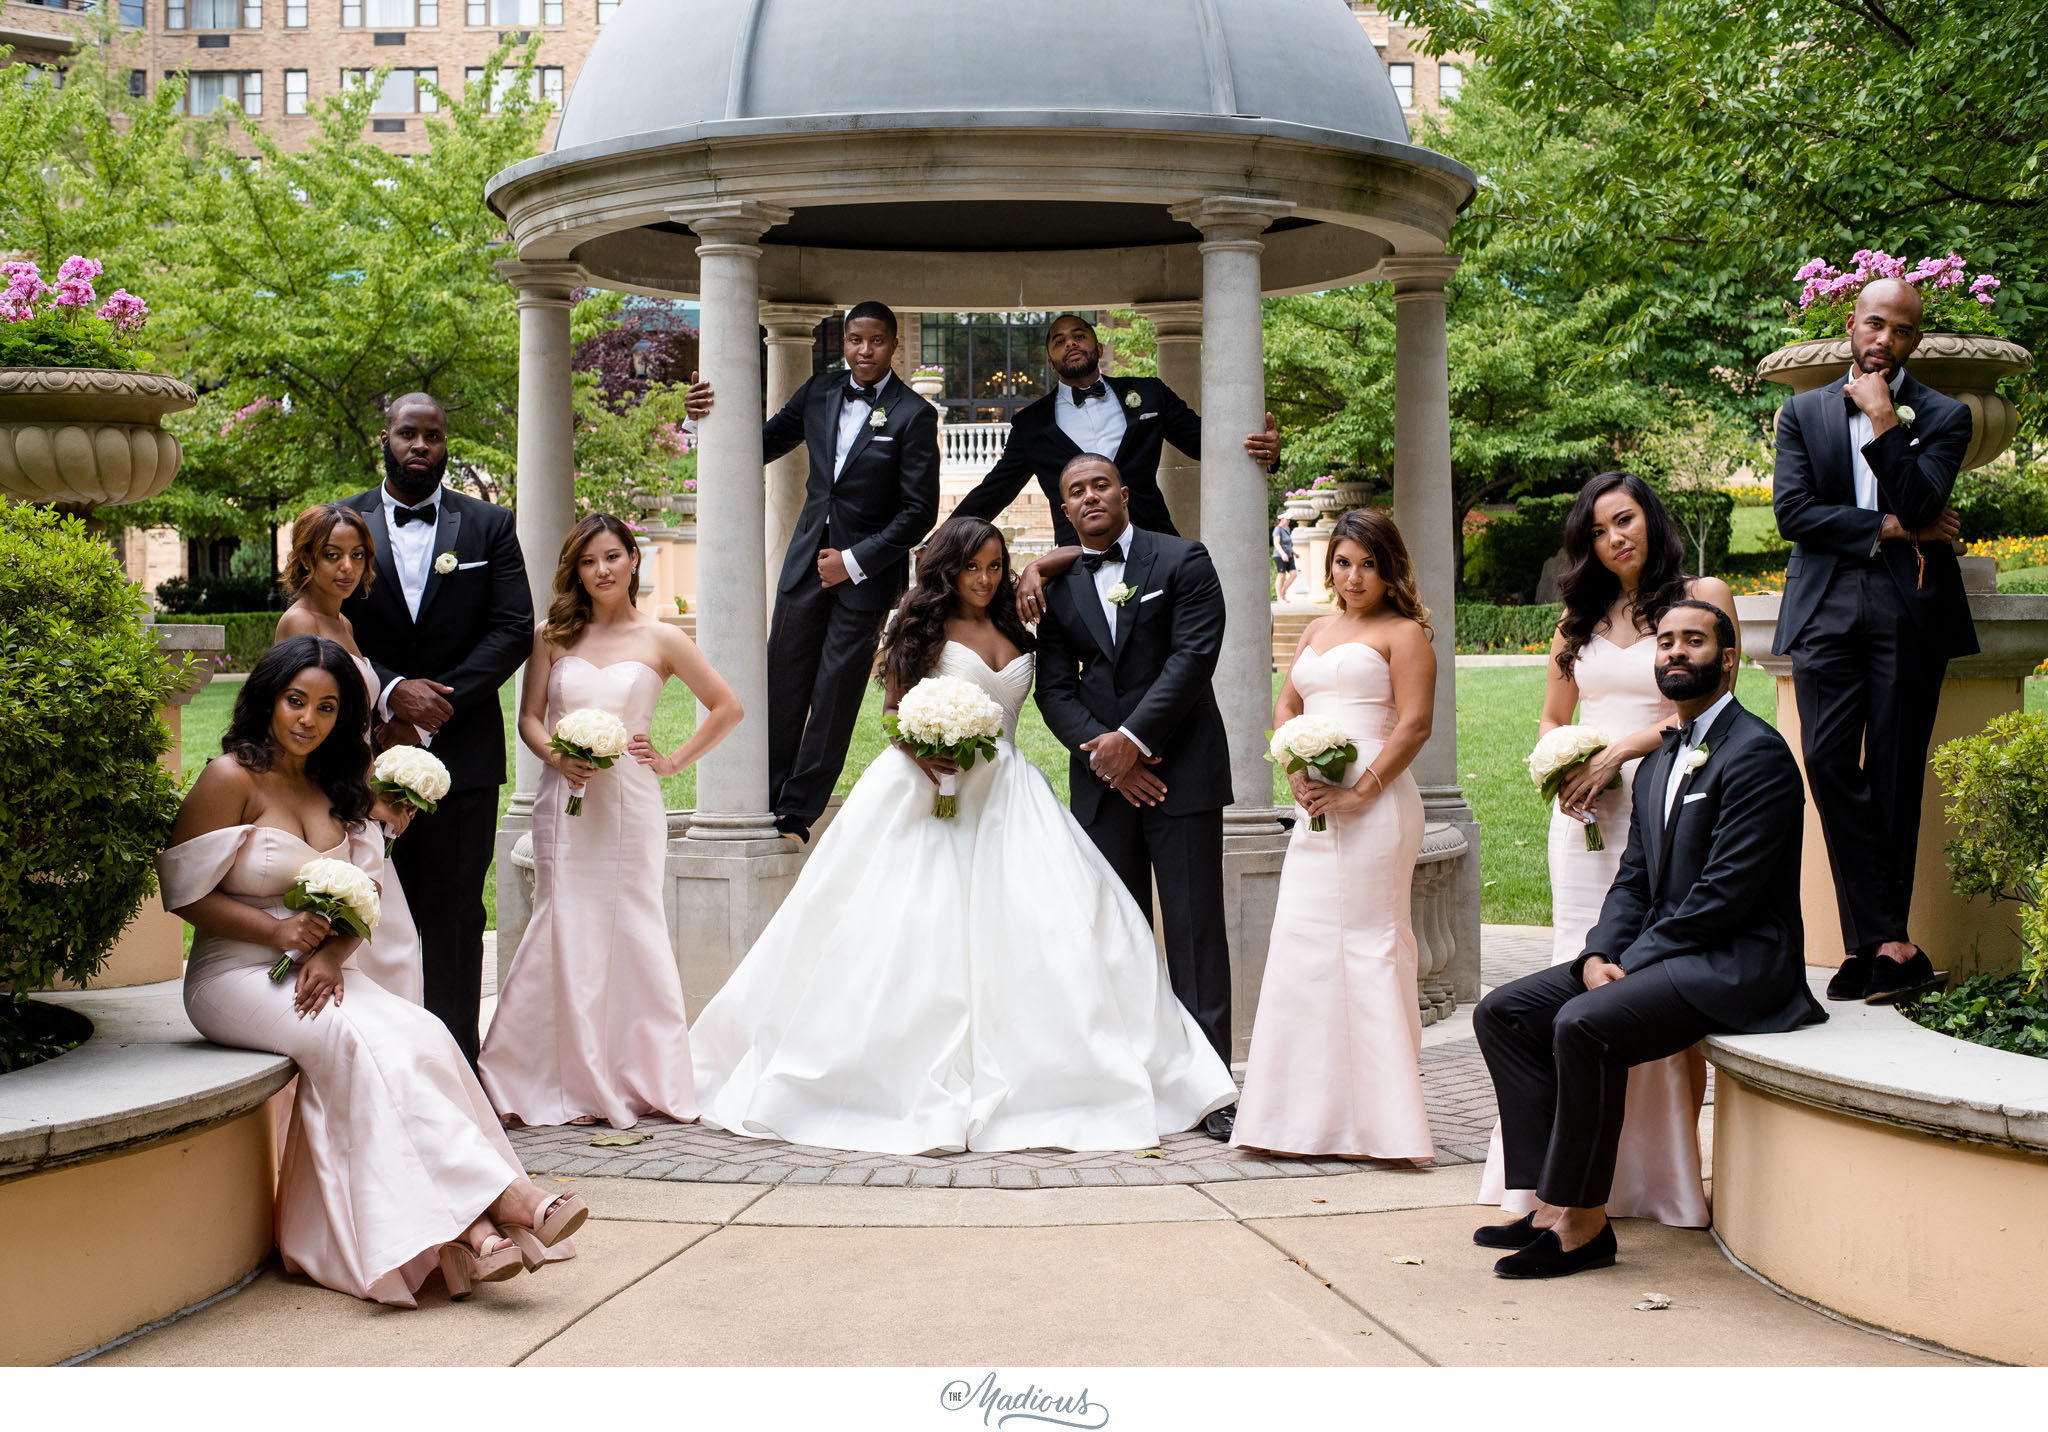 nmwa+wedding,+women+in+the+arts+wedding,+ethiopian+wedding,+dc+wedding+0132.jpg